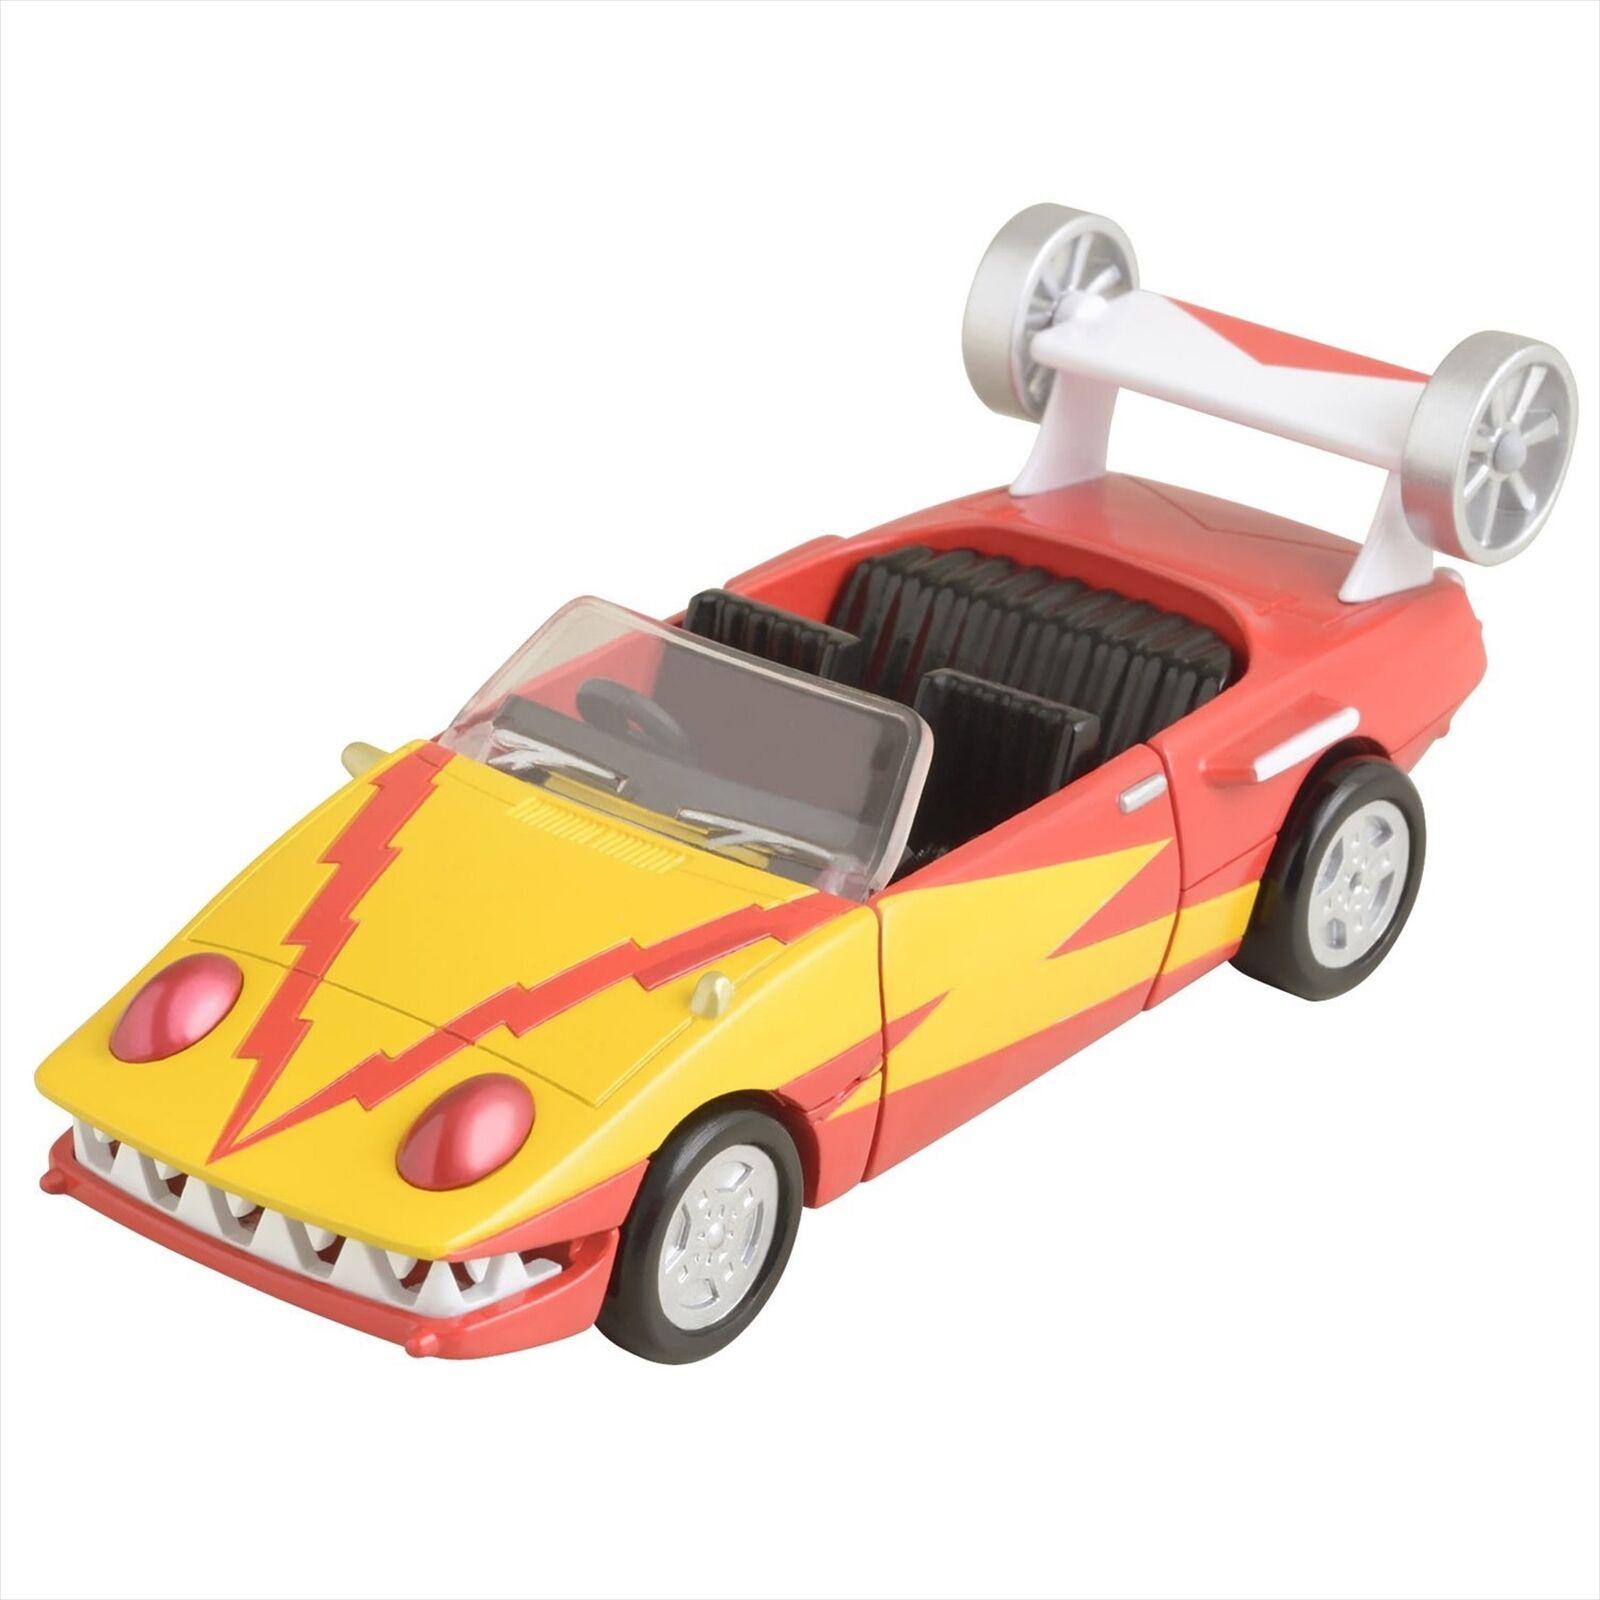 Evolution Toy Metal Action No.7 Inazuman Raijingo Vehicle Action Figure